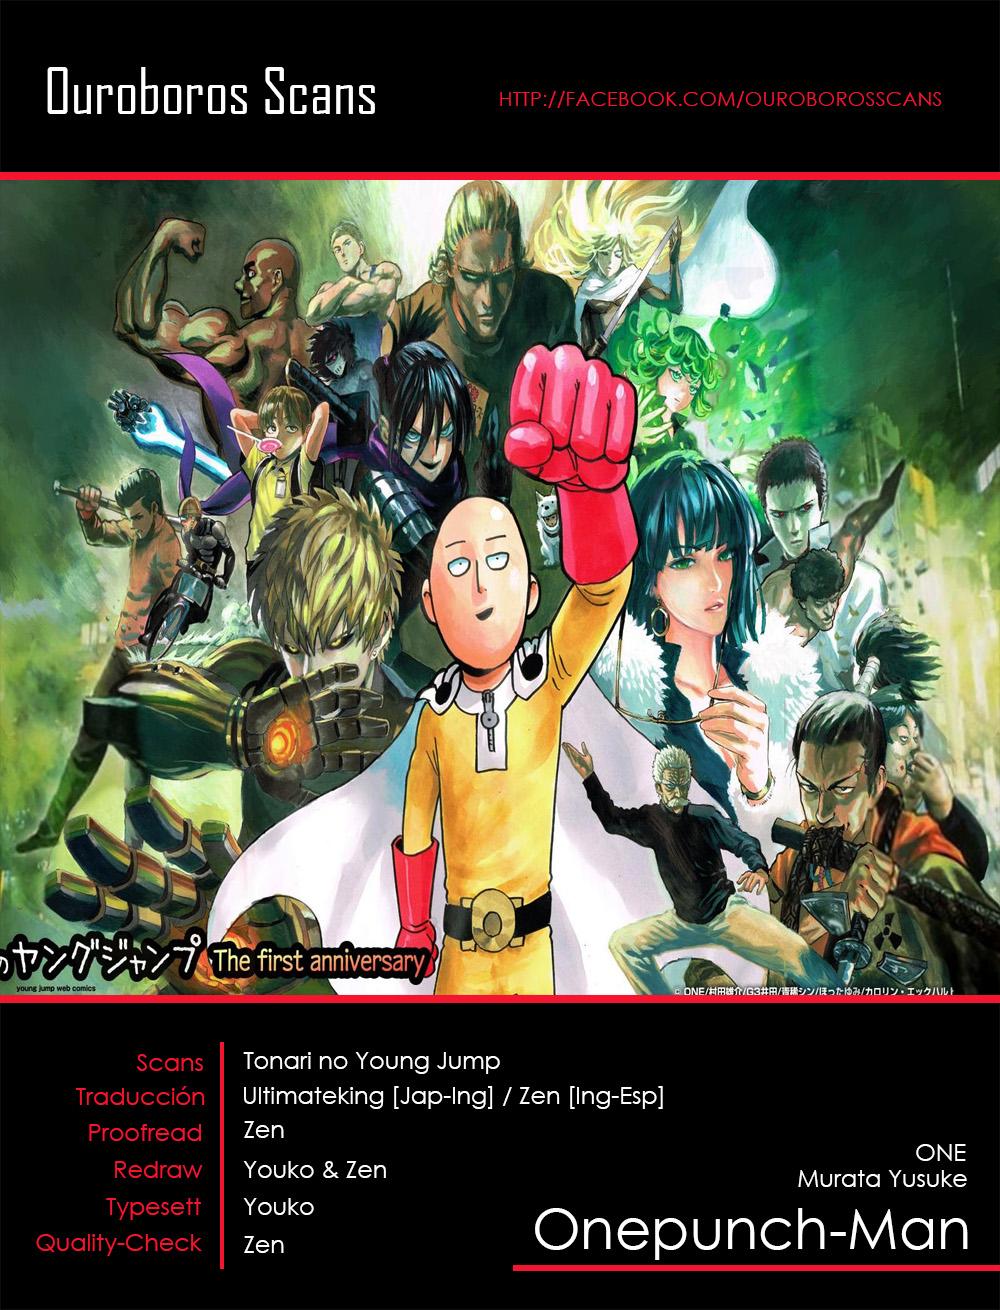 http://c5.ninemanga.com/es_manga/21/14805/419042/89332a47697d46ed6543d51ac348bafb.jpg Page 1